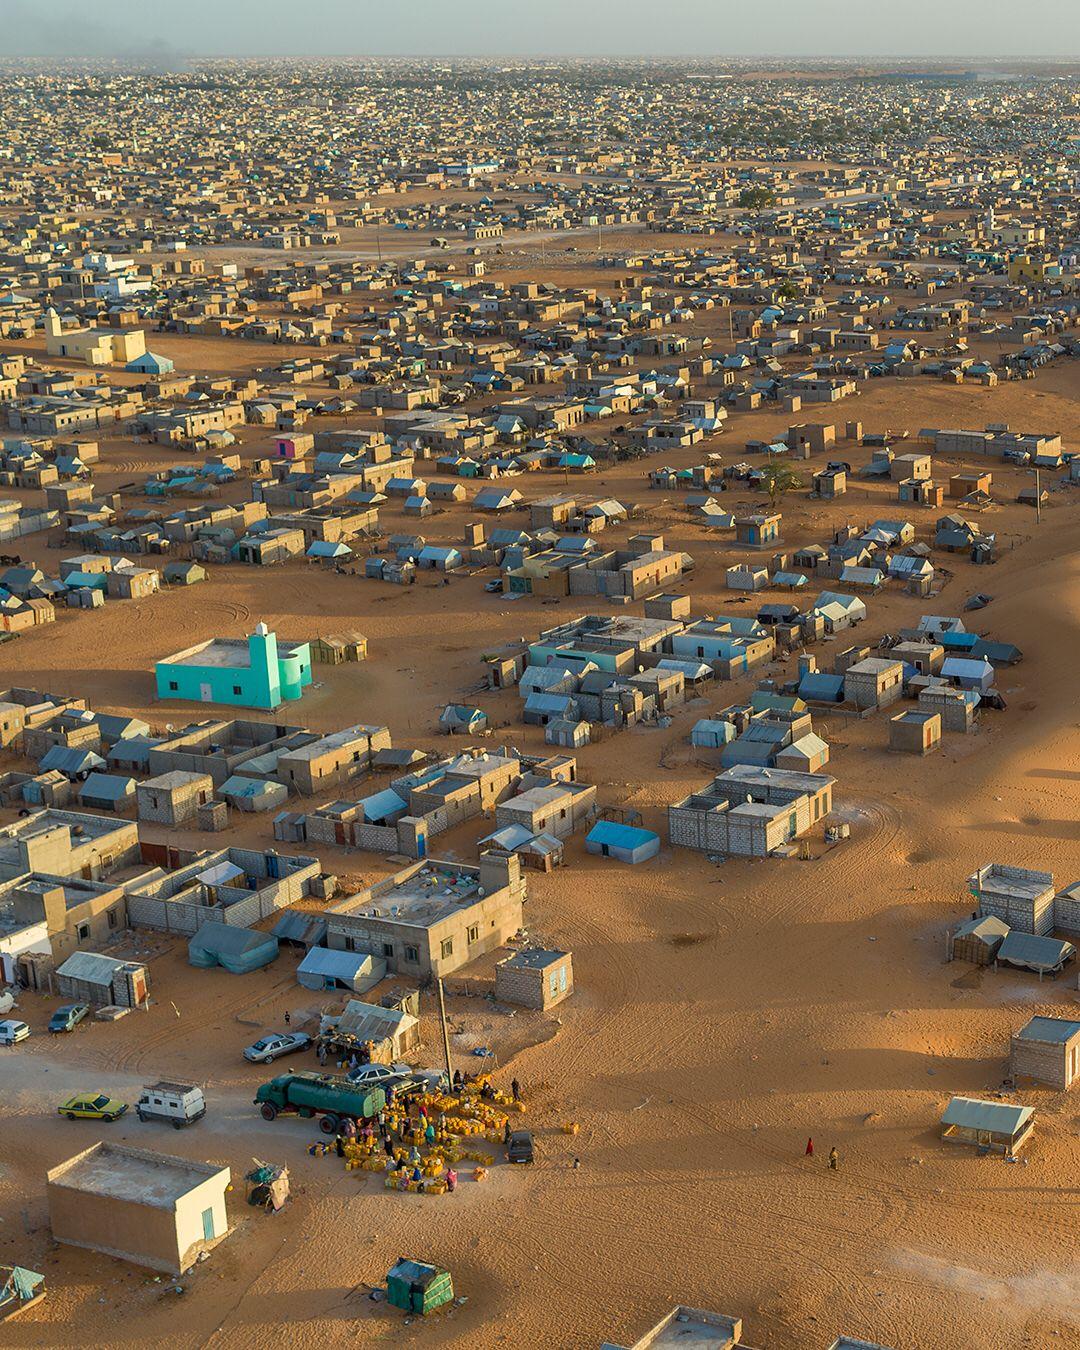 George Steinmetz On Instagram The Suburbs Of Nouakchott The Capital Of Mauritania Are Fighting A Losing Battle Agains Windb Nouakchott Mauritania Instagram